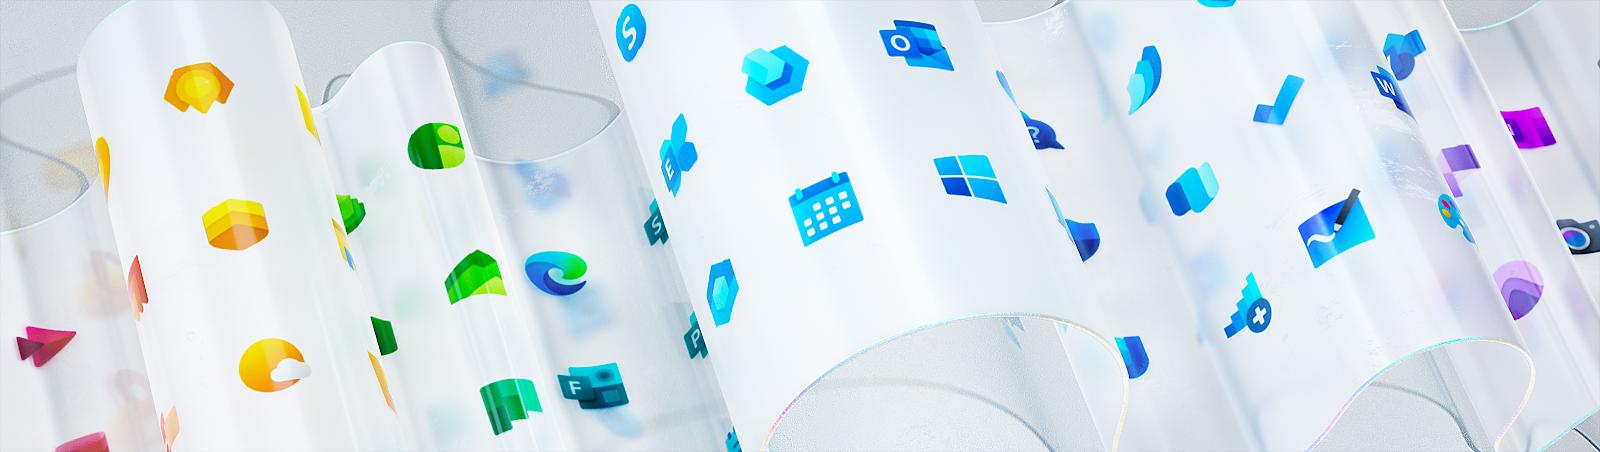 Microsoft-rinnovamento-100-icone